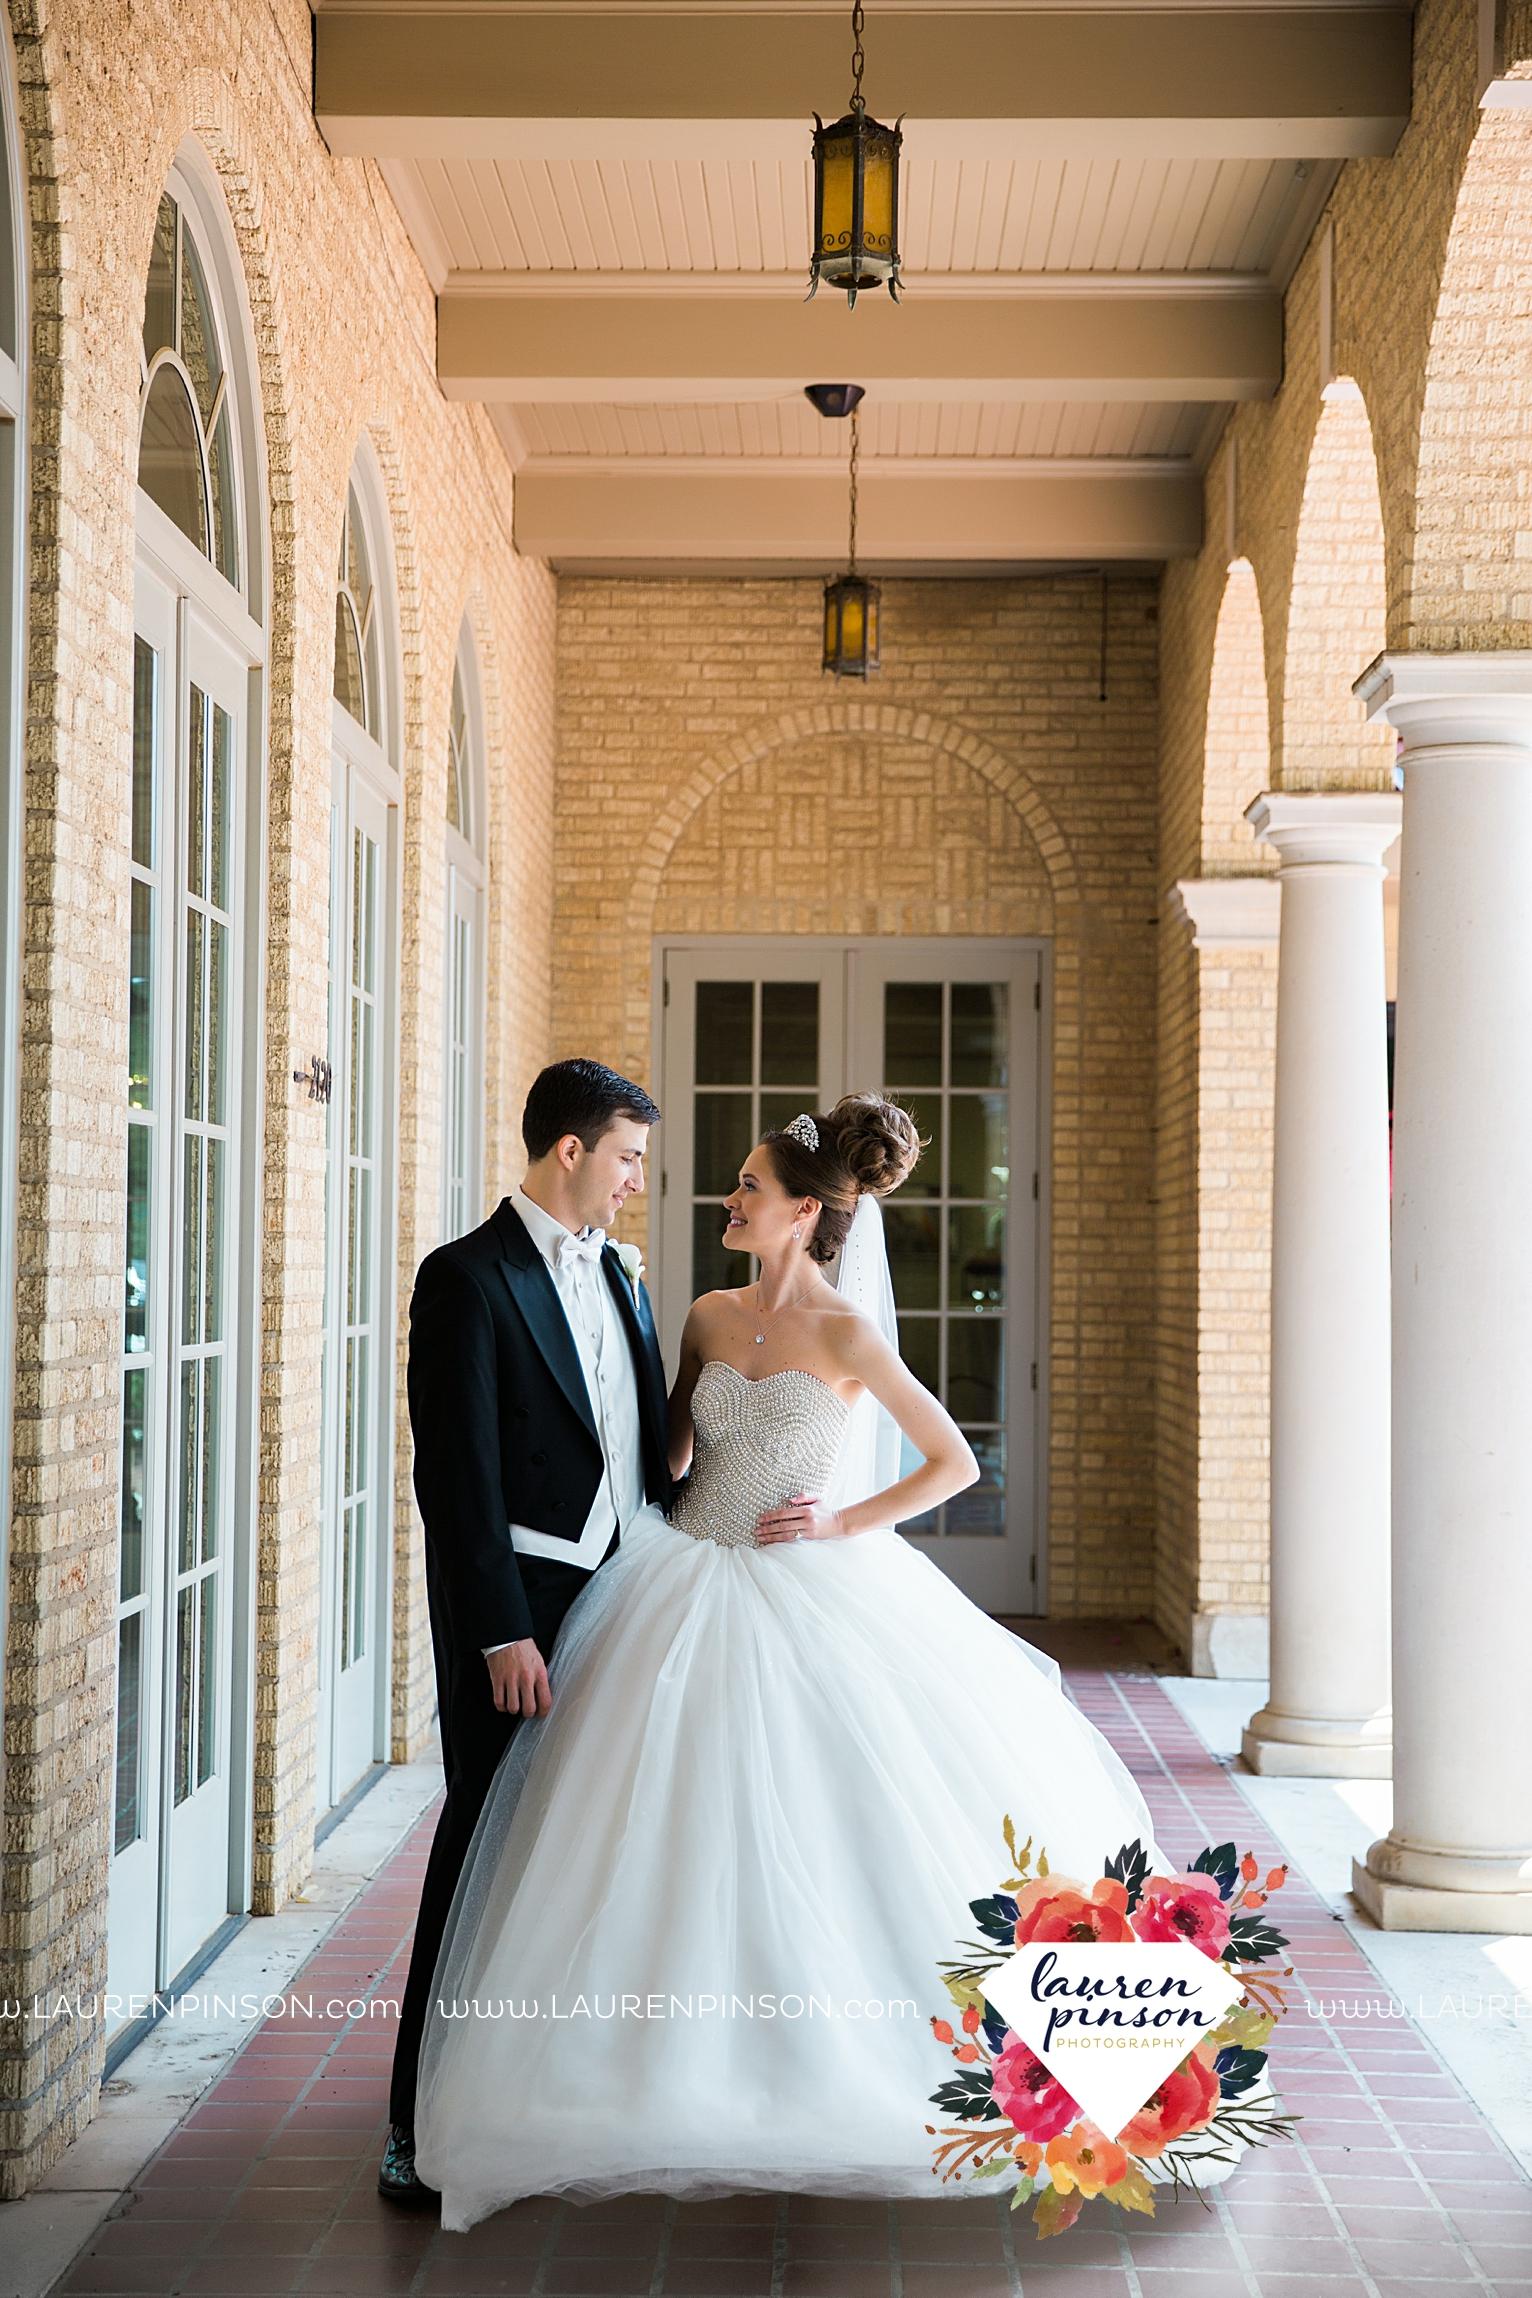 wichita-falls-texas-wedding-photographer-the-forum-by-the-kemp-mayfield-events-ulta-gold-glitter_2829.jpg